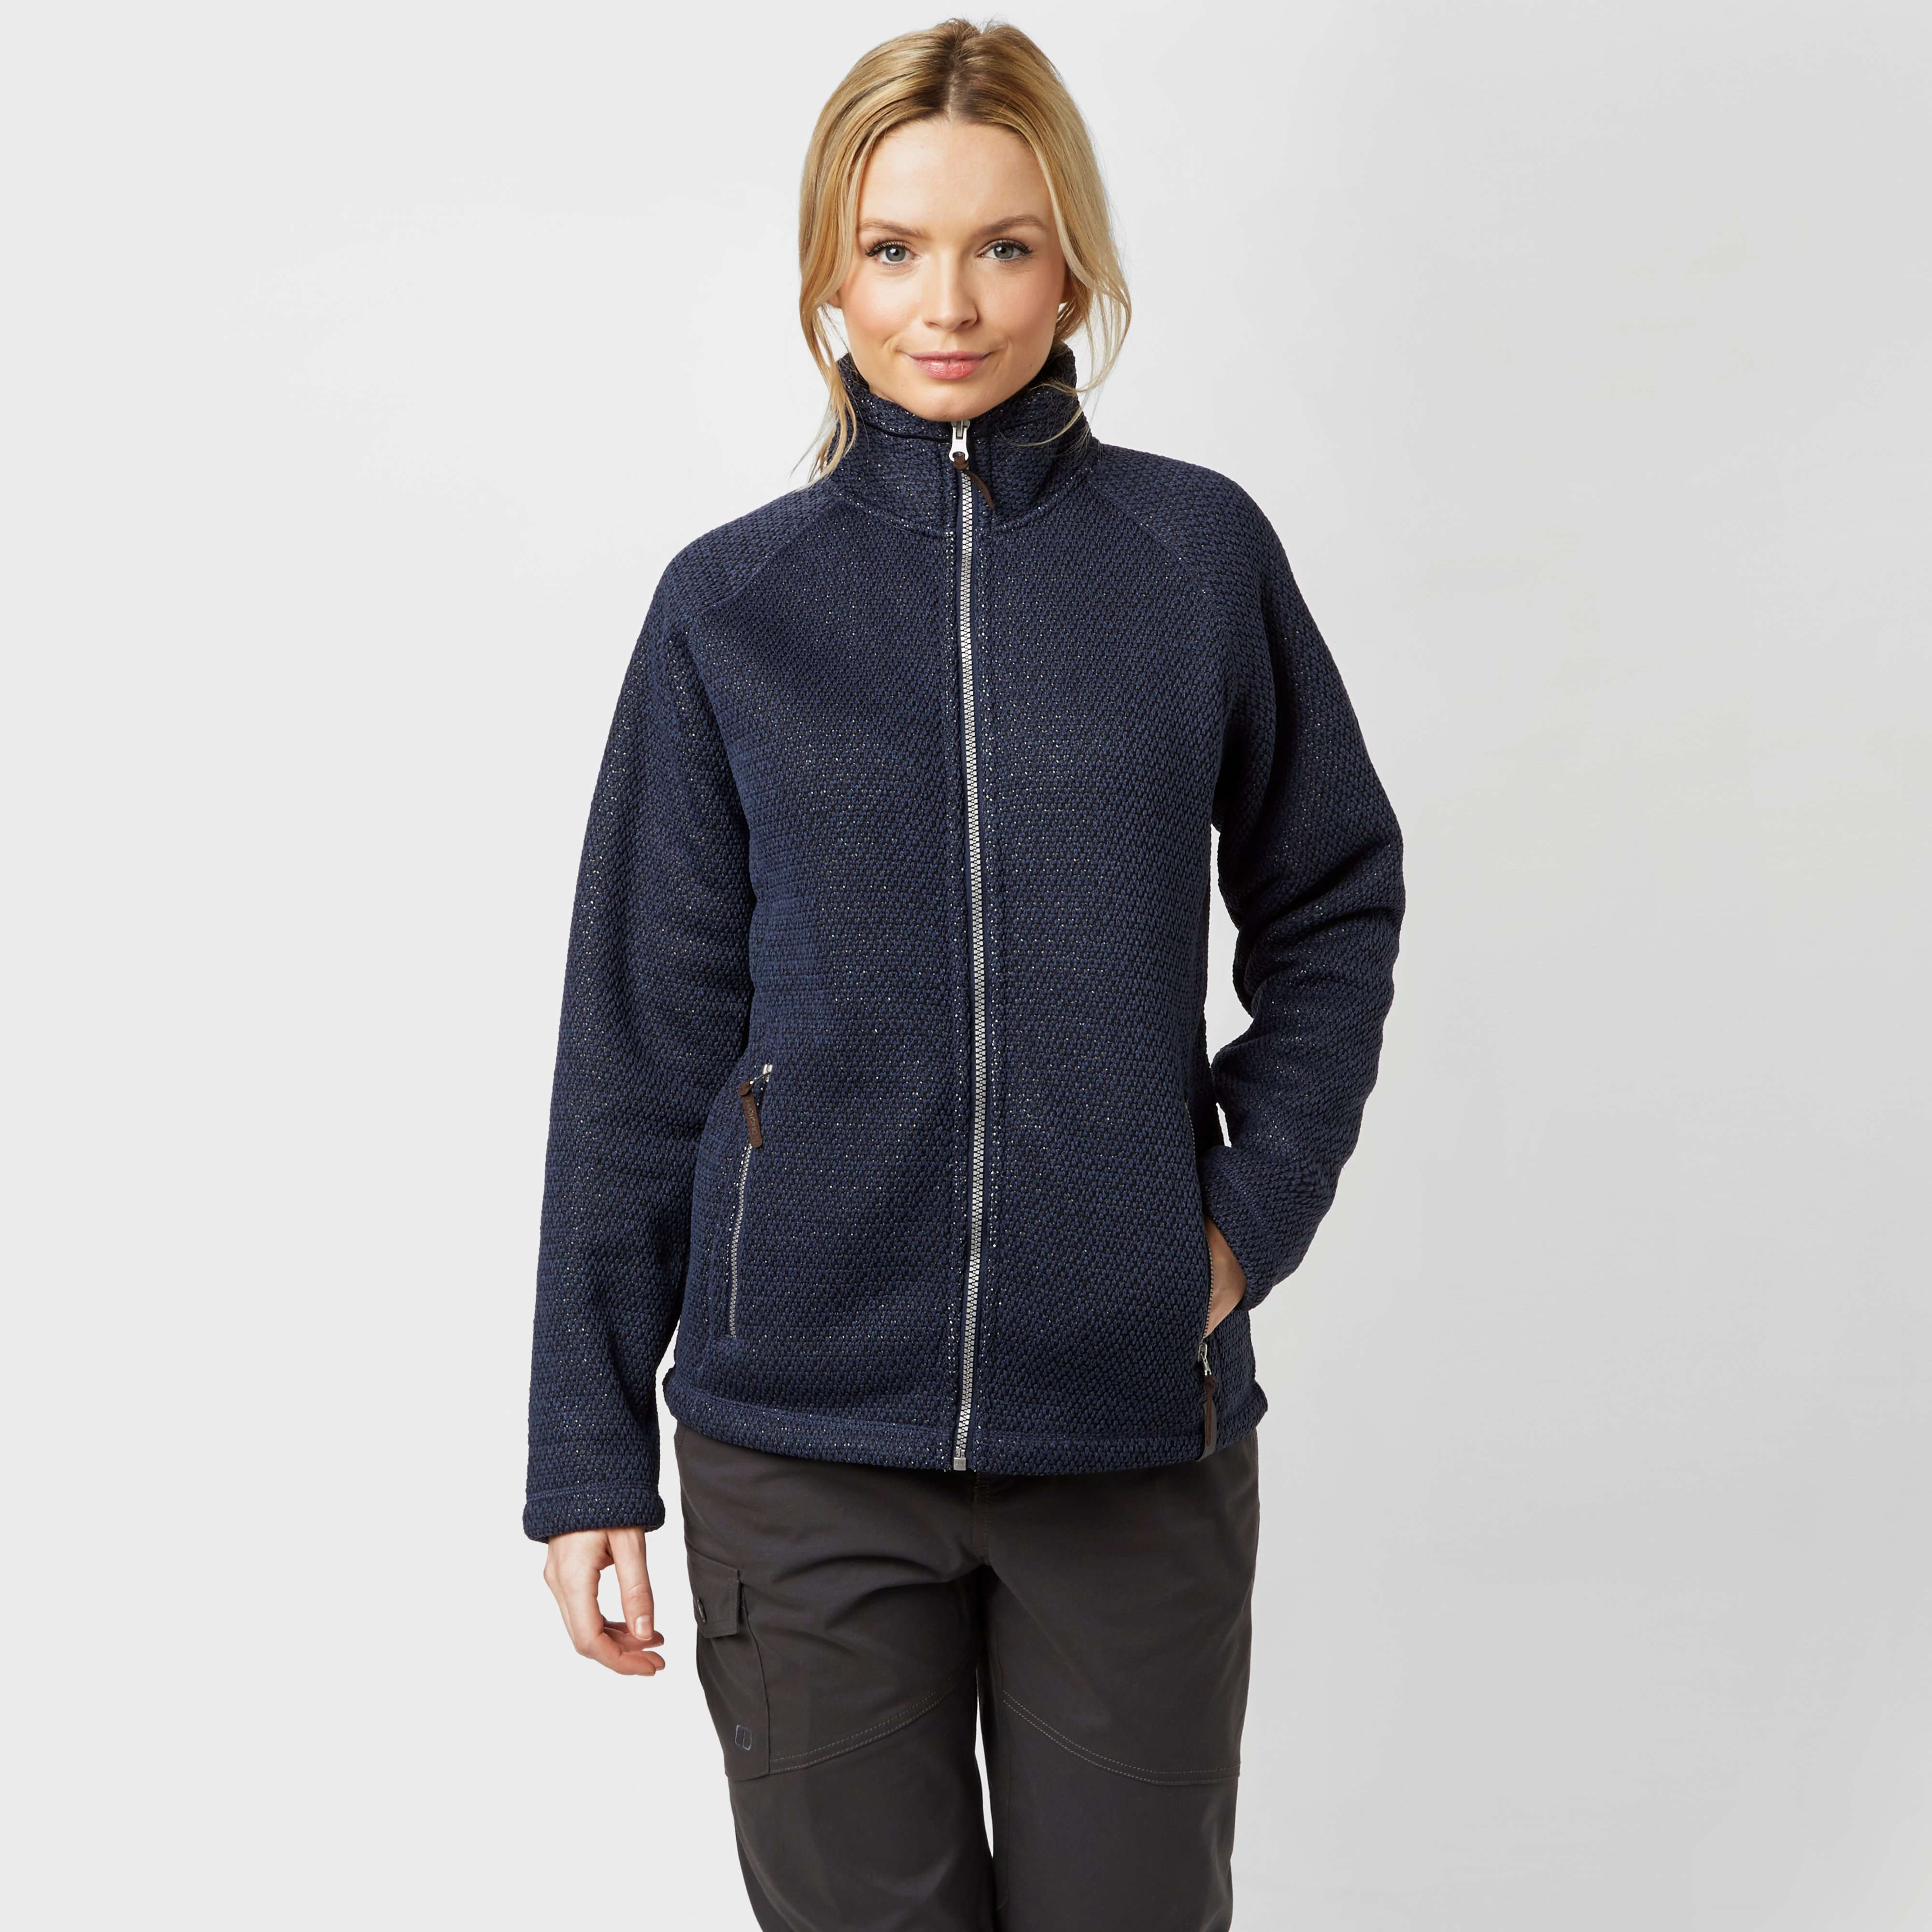 CRAGHOPPERS Women's Cayton Fleece Jacket